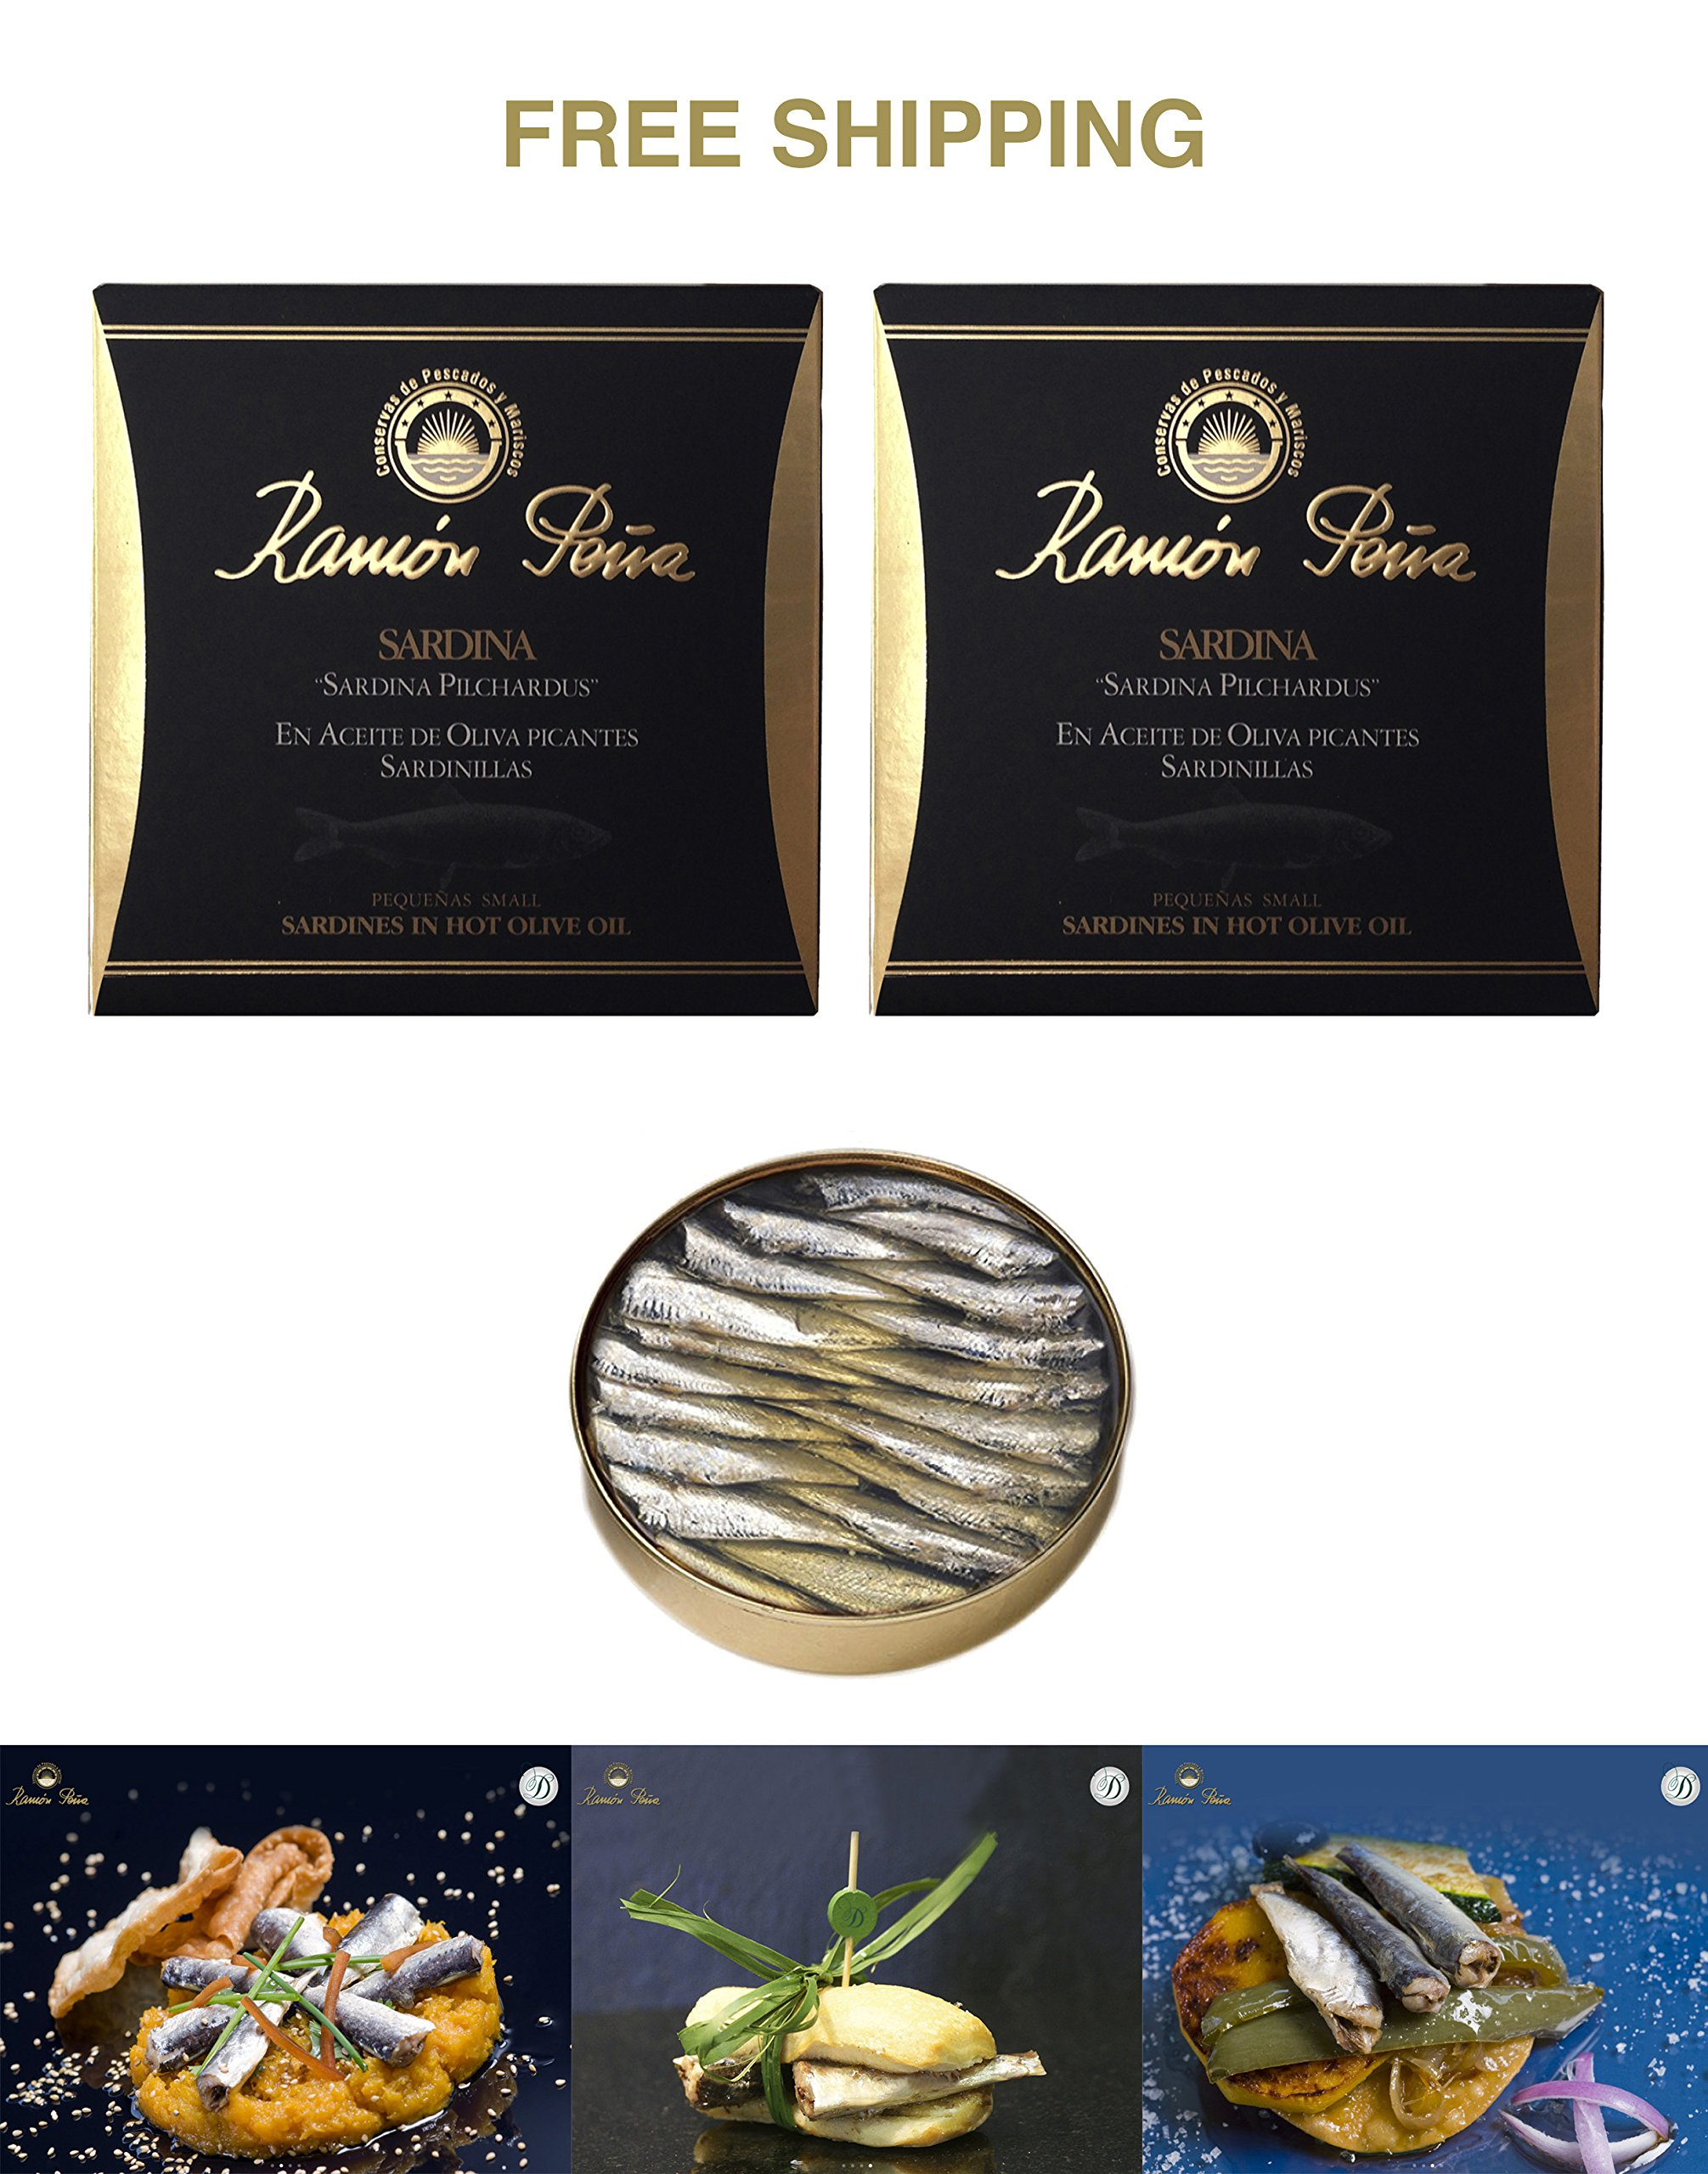 Baby sardines in spiced olive oil (15/20 pieces) 2 tins x 130 g, Ramón Peña / Spain